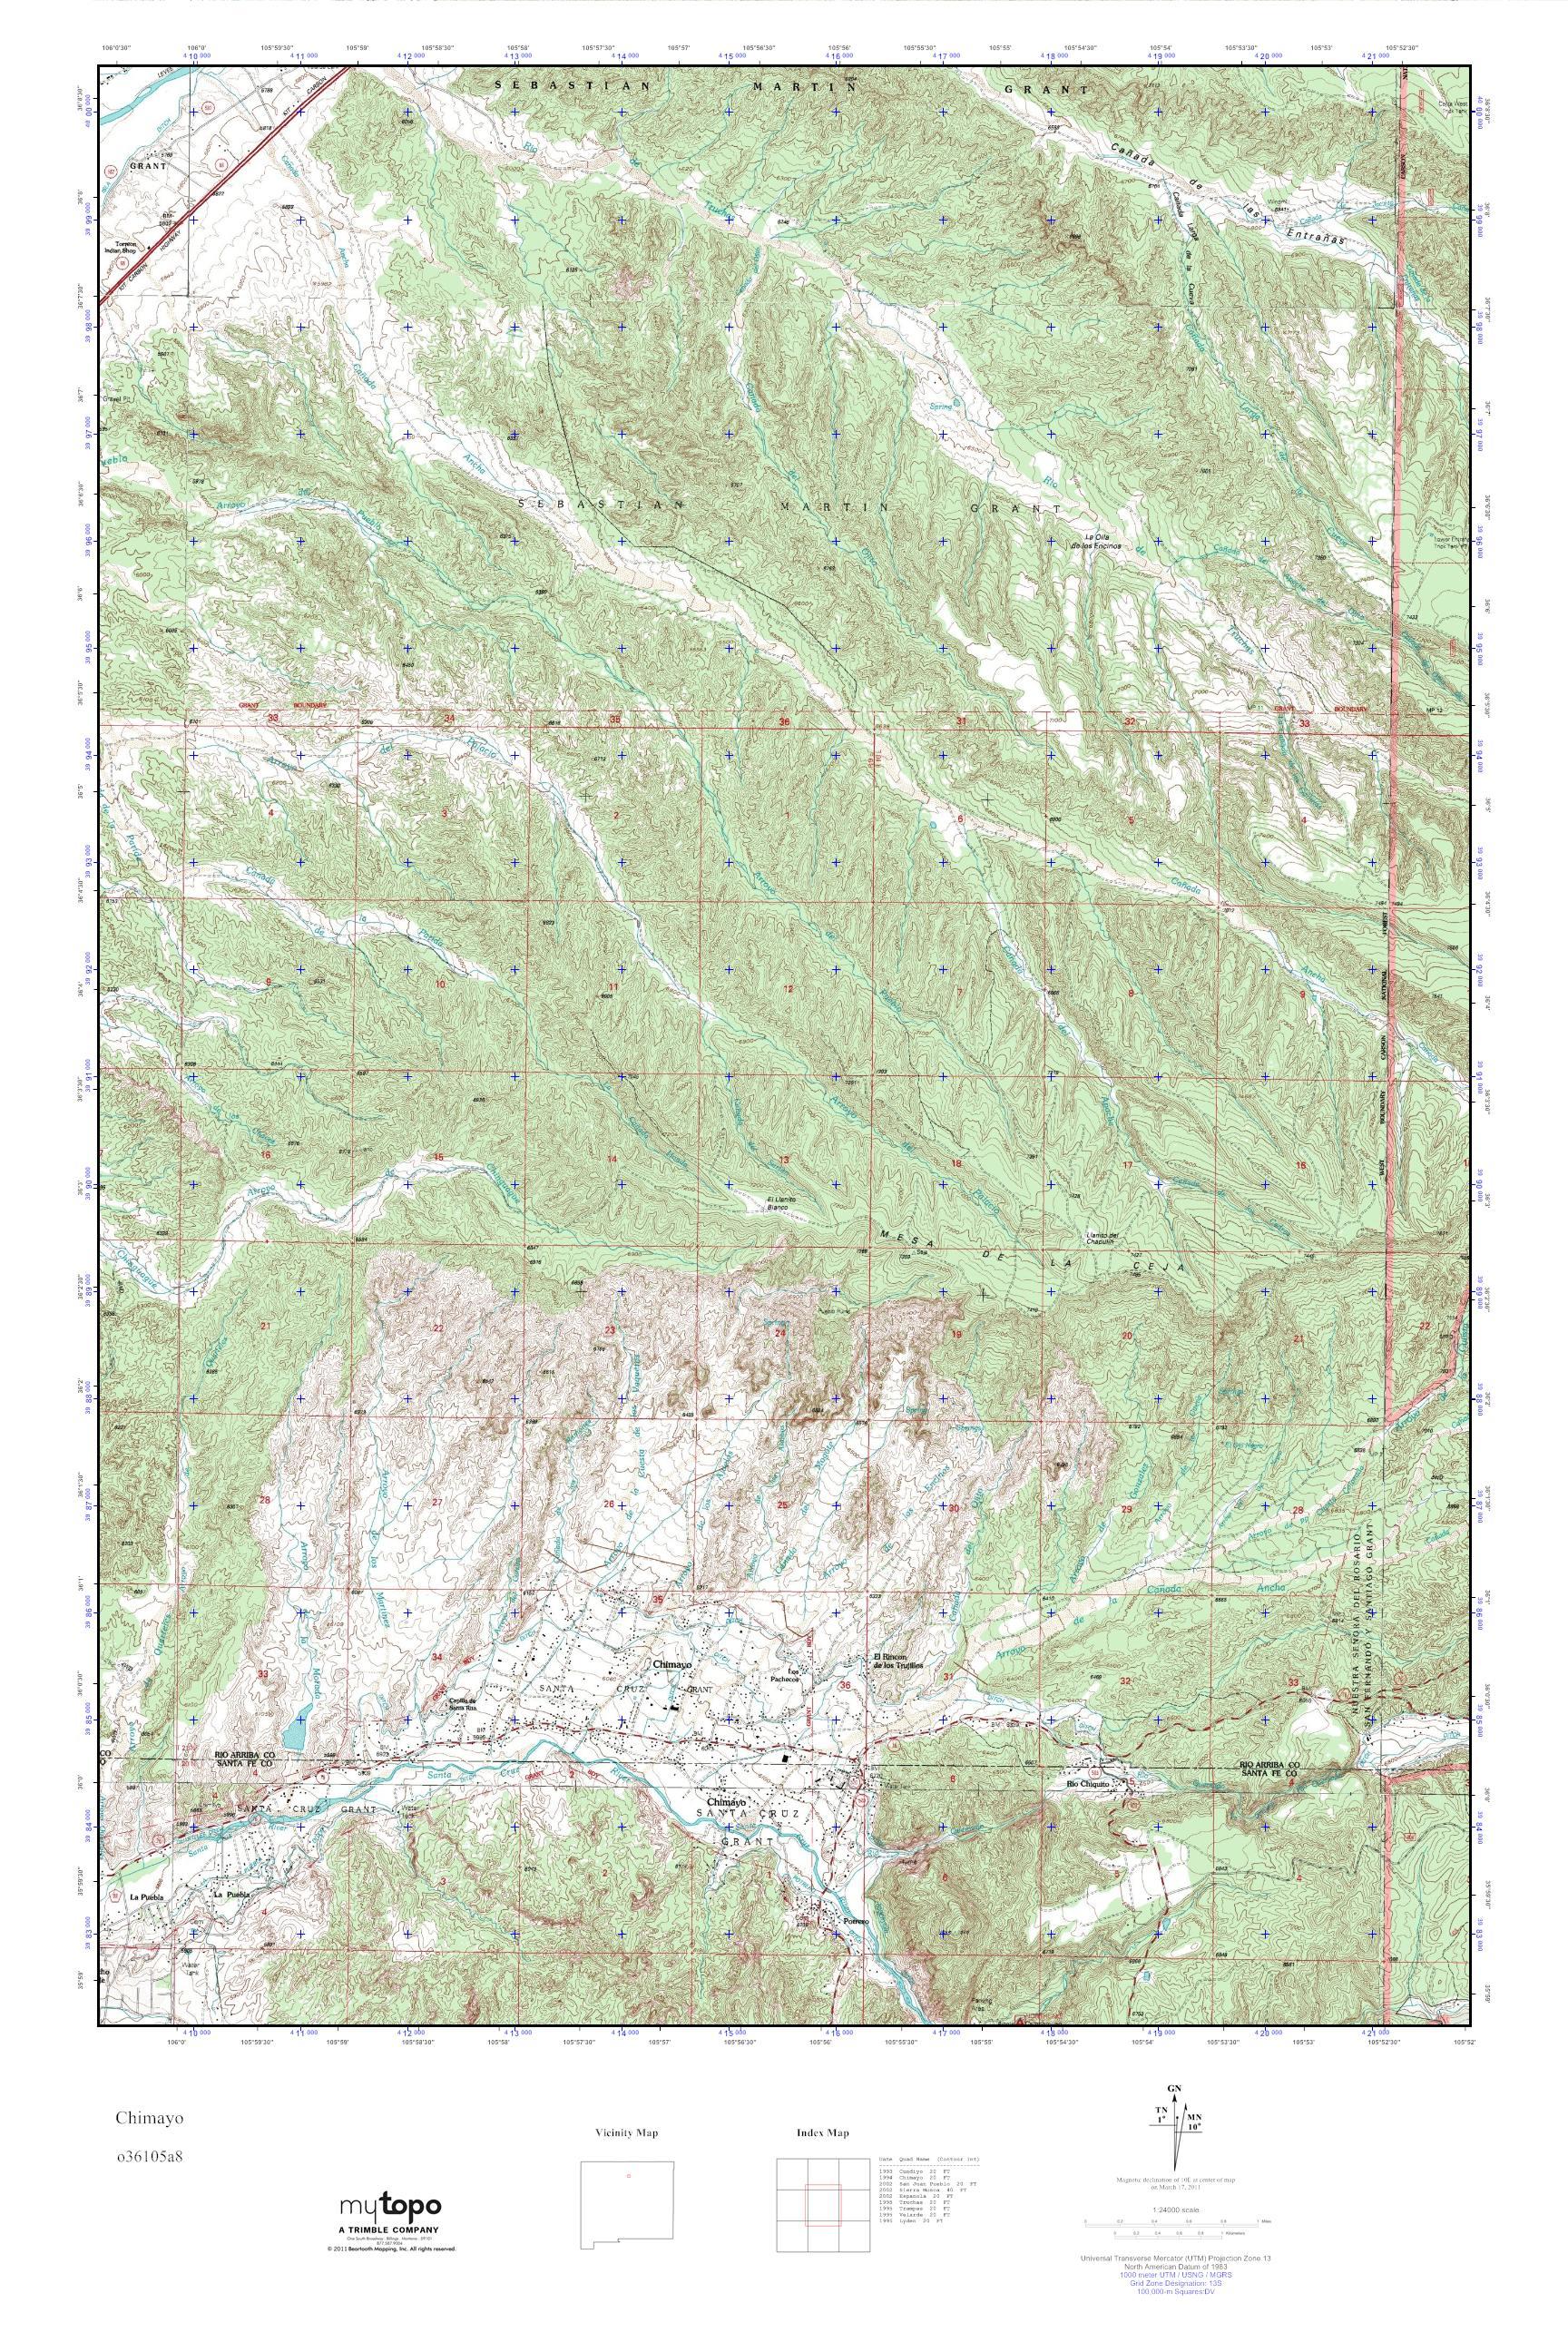 Mytopo Chimayo New Mexico Usgs Quad Topo Map